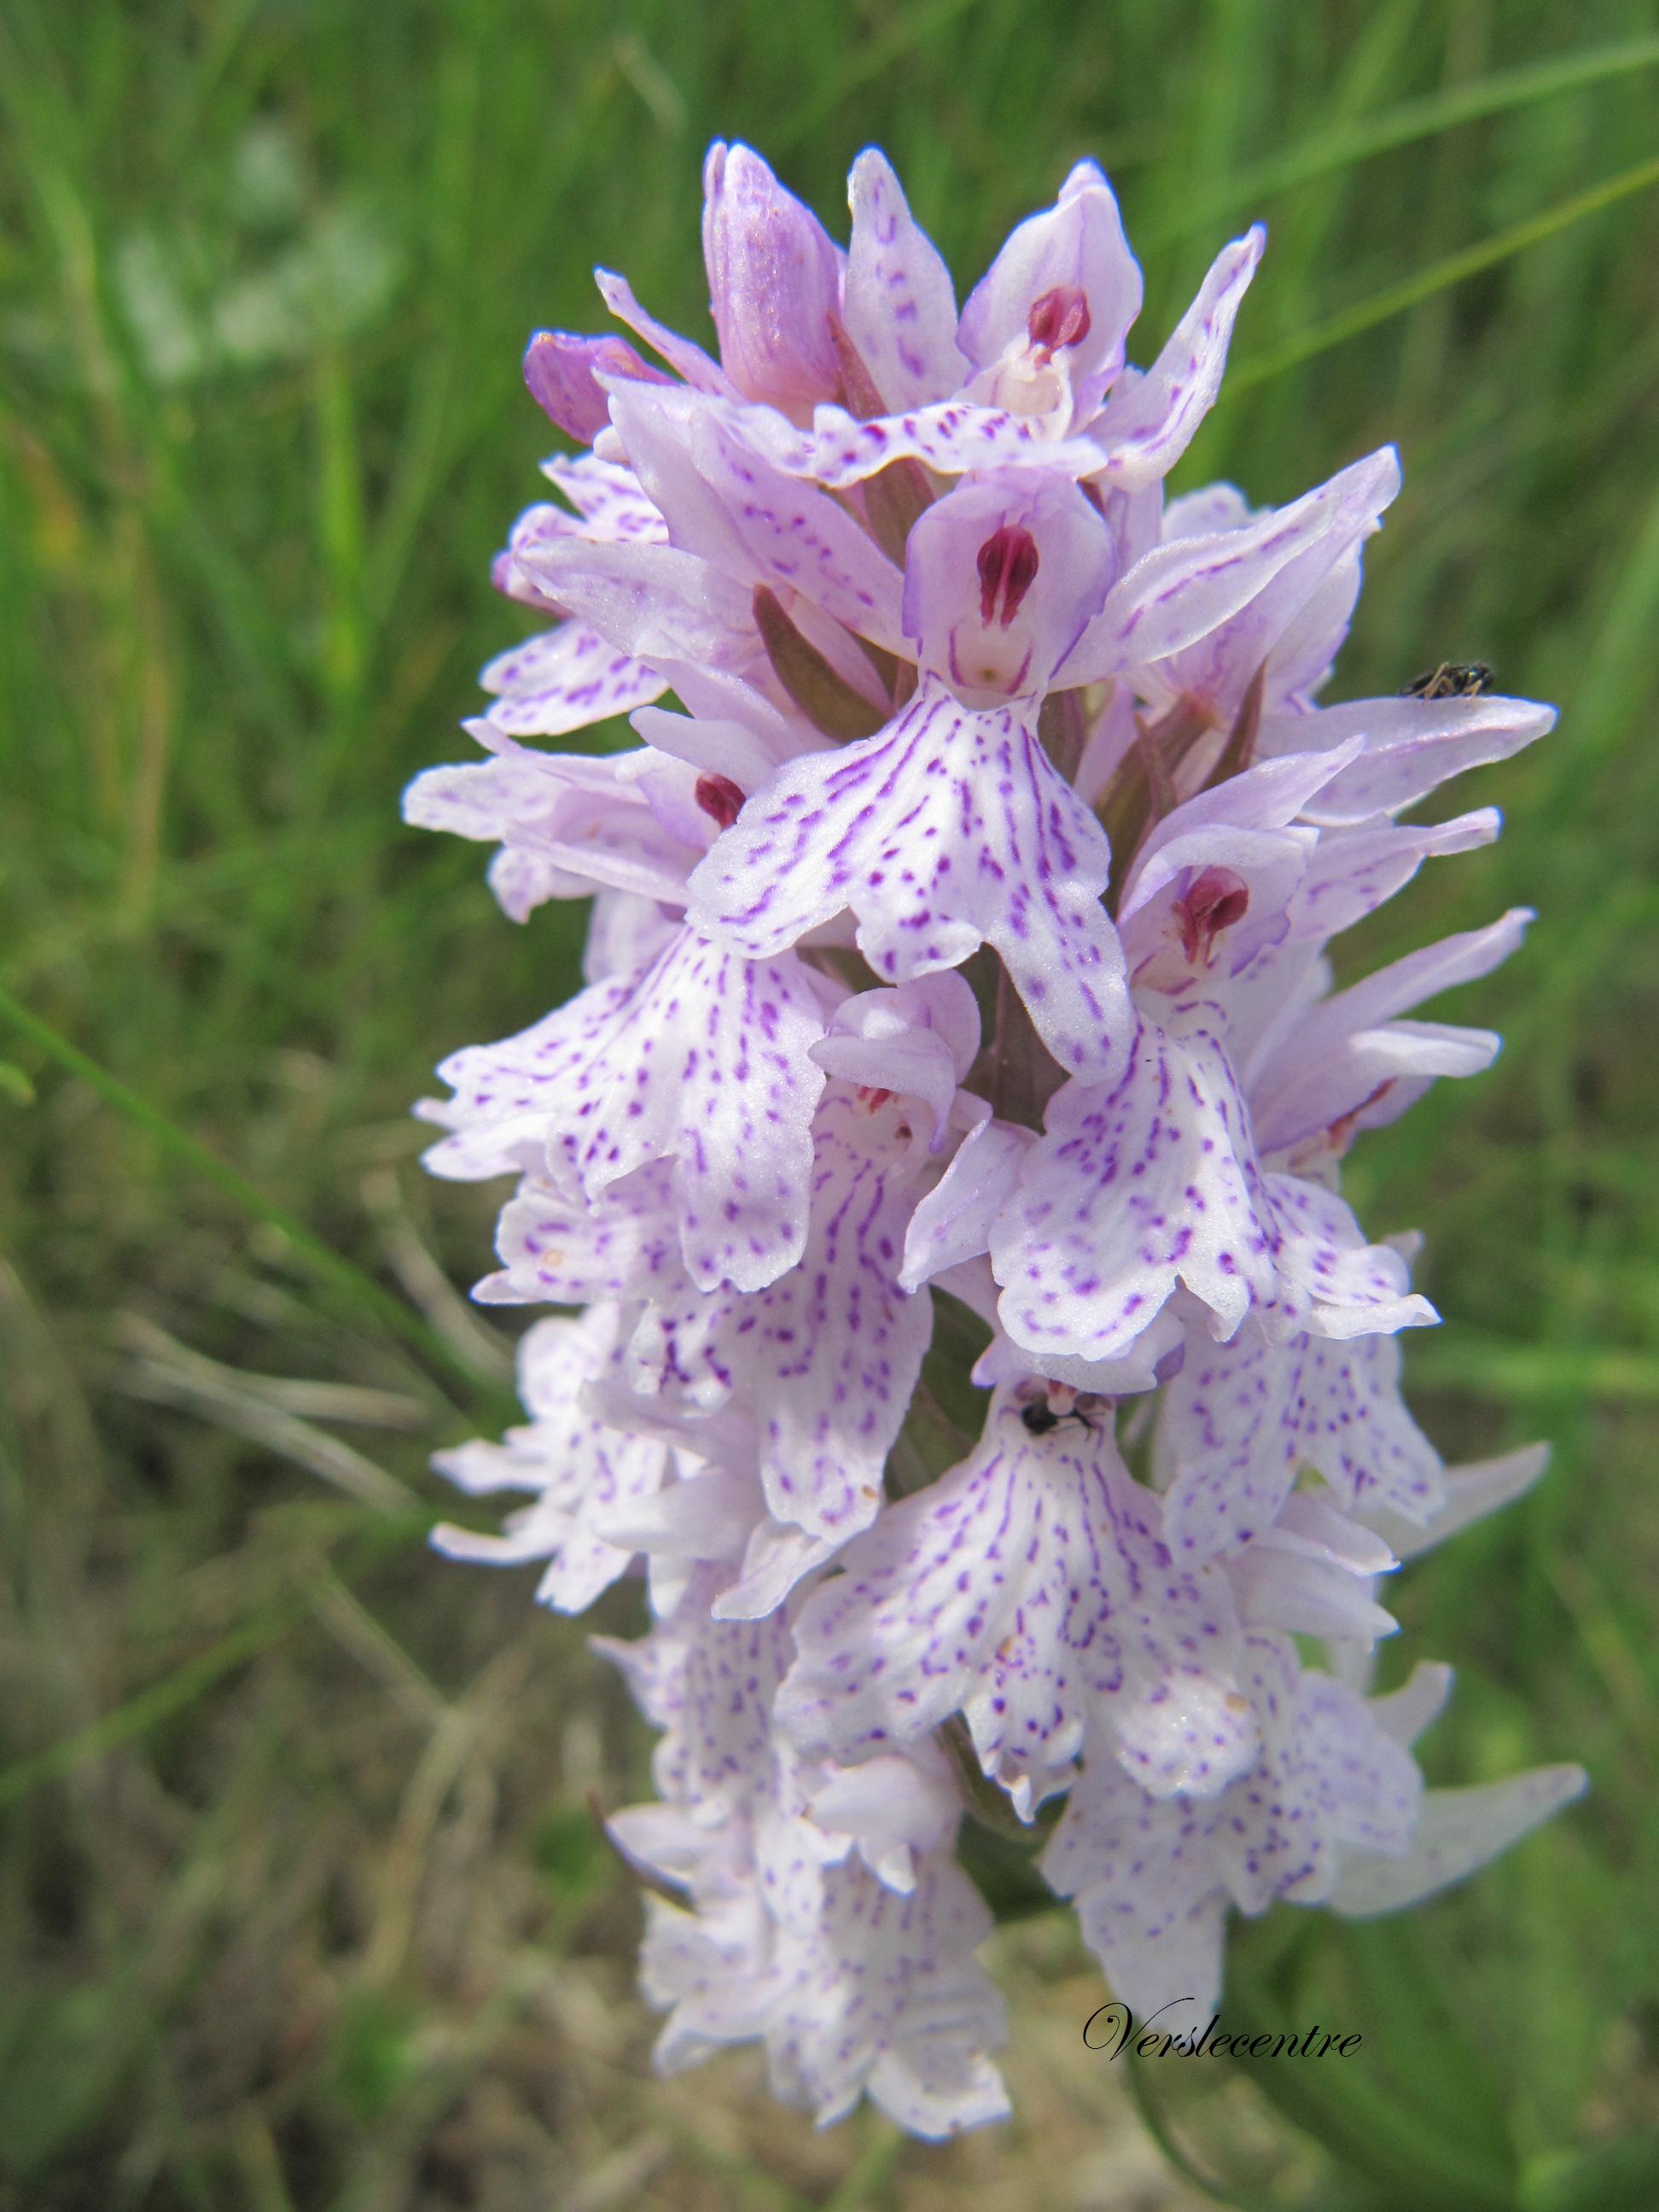 orchidee sauvage ardeche